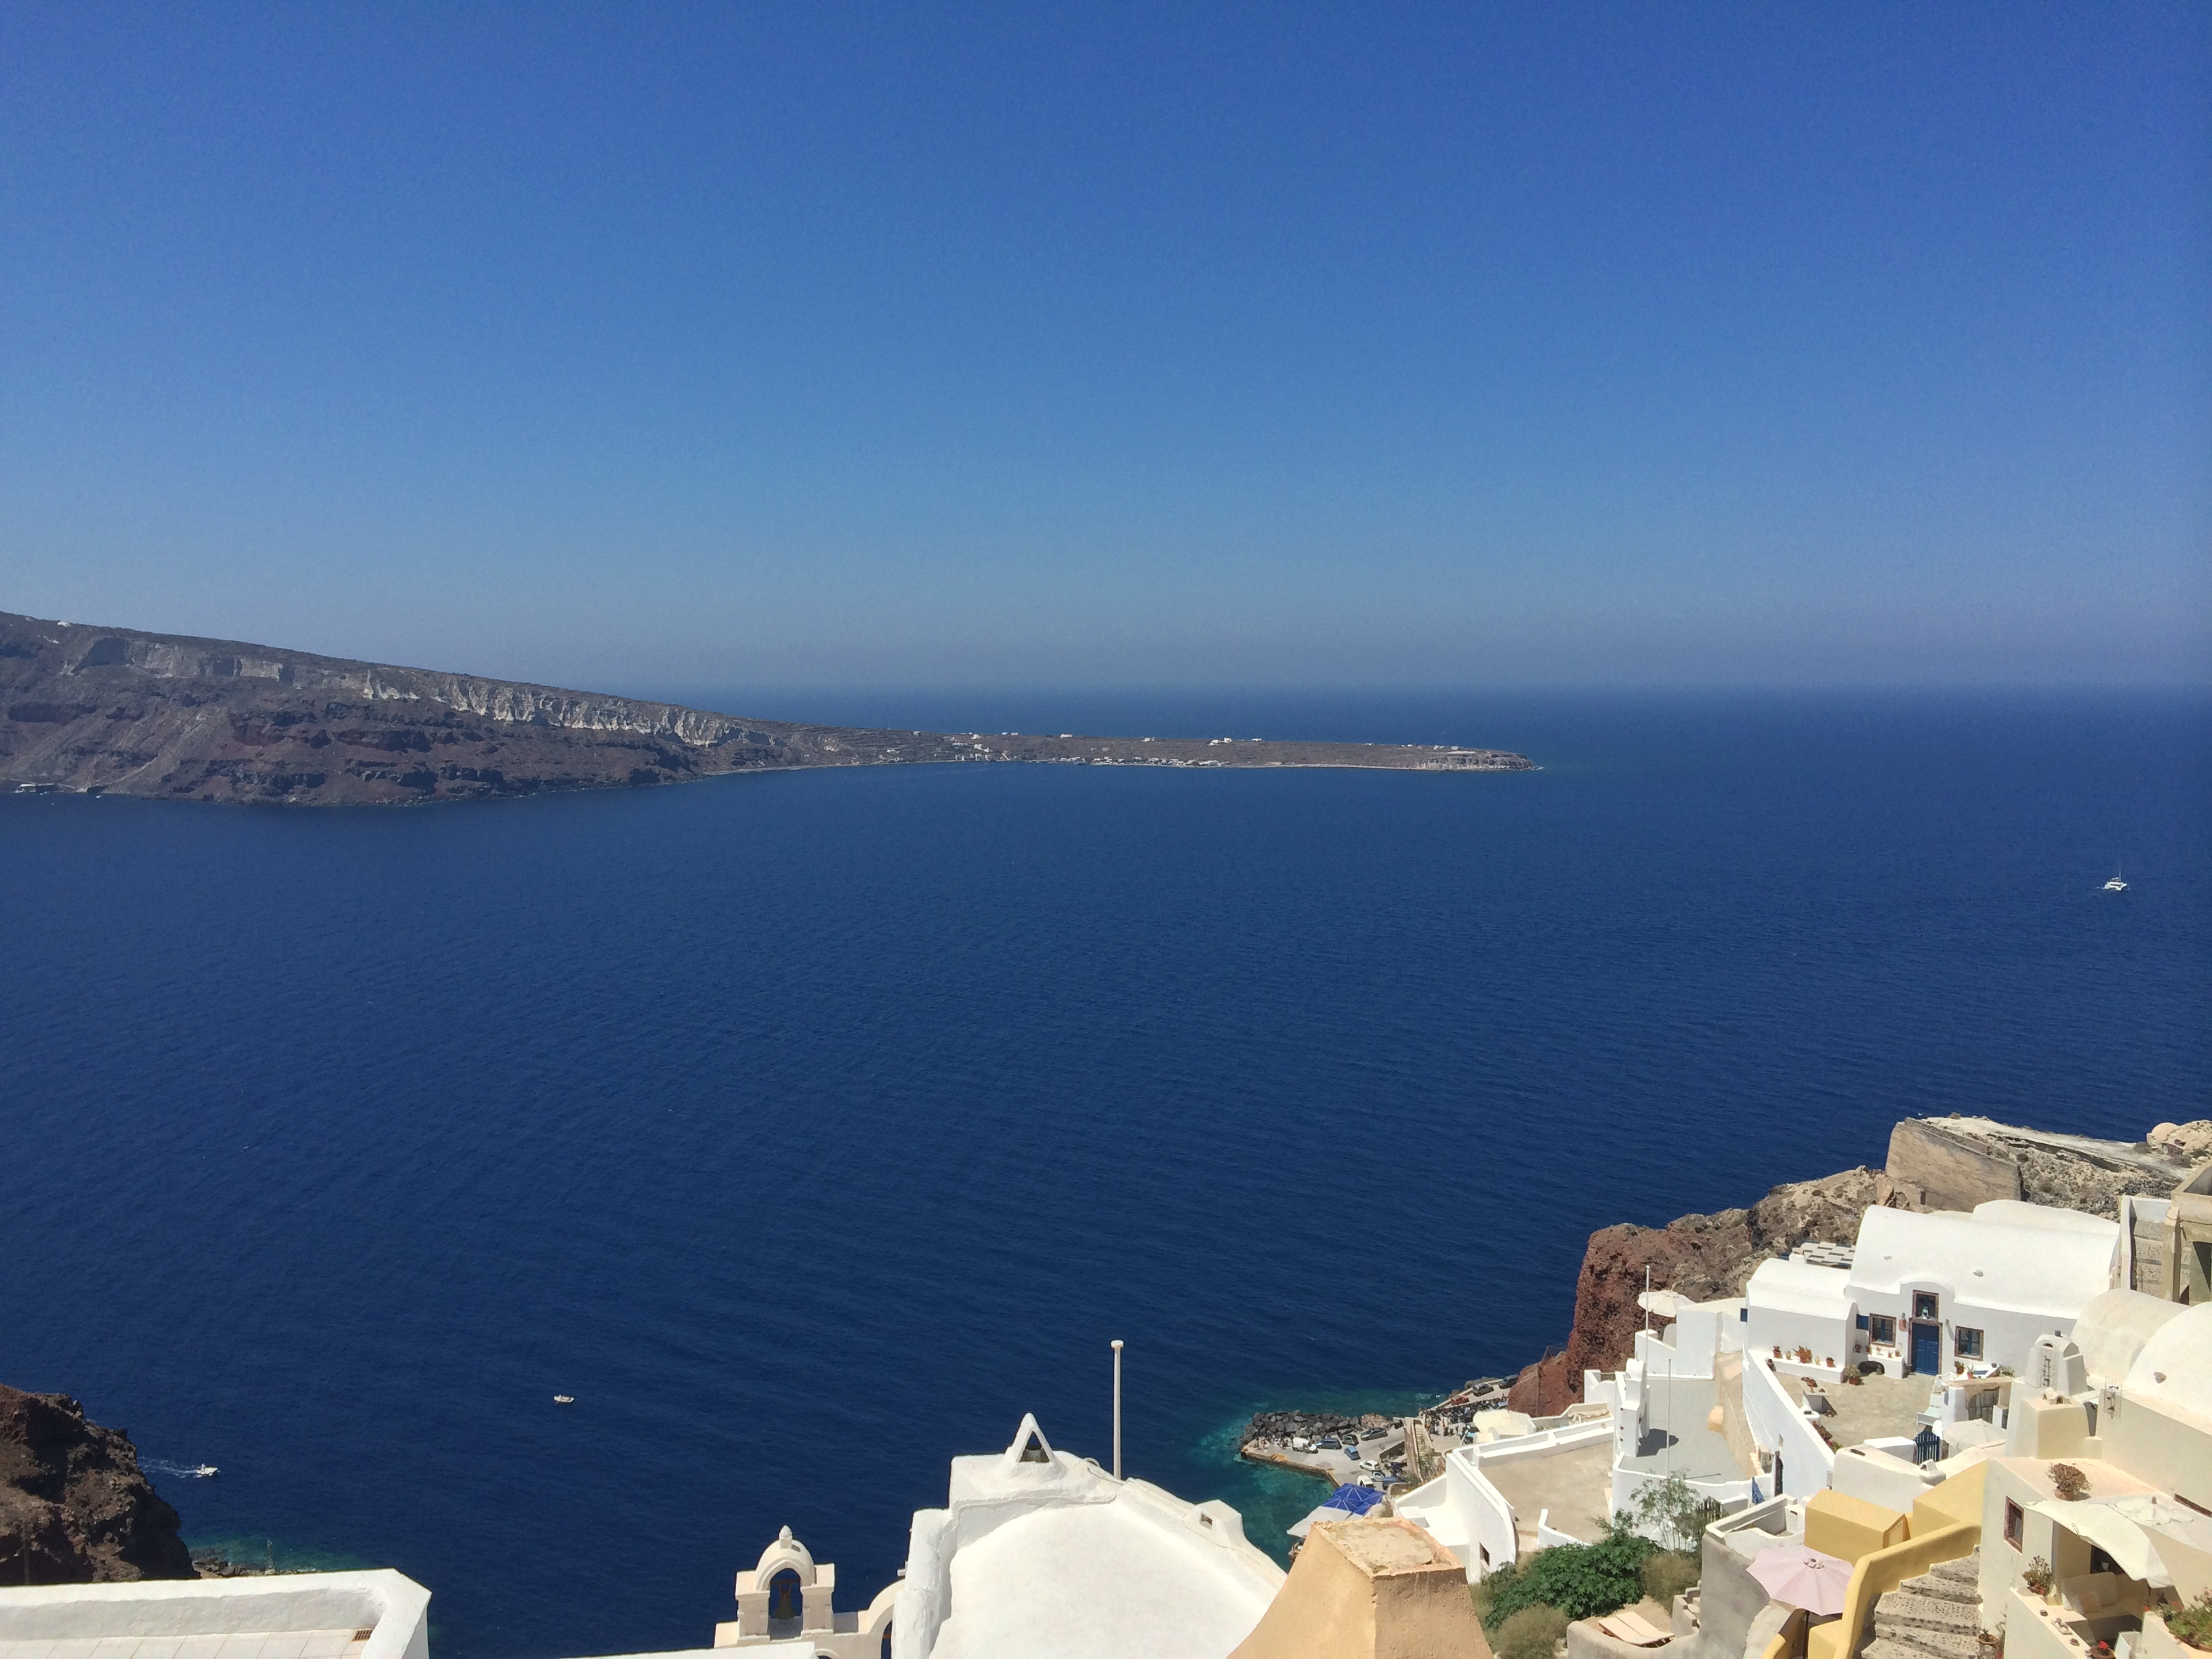 Santorin Greece Wo soll's denn hin gehen?